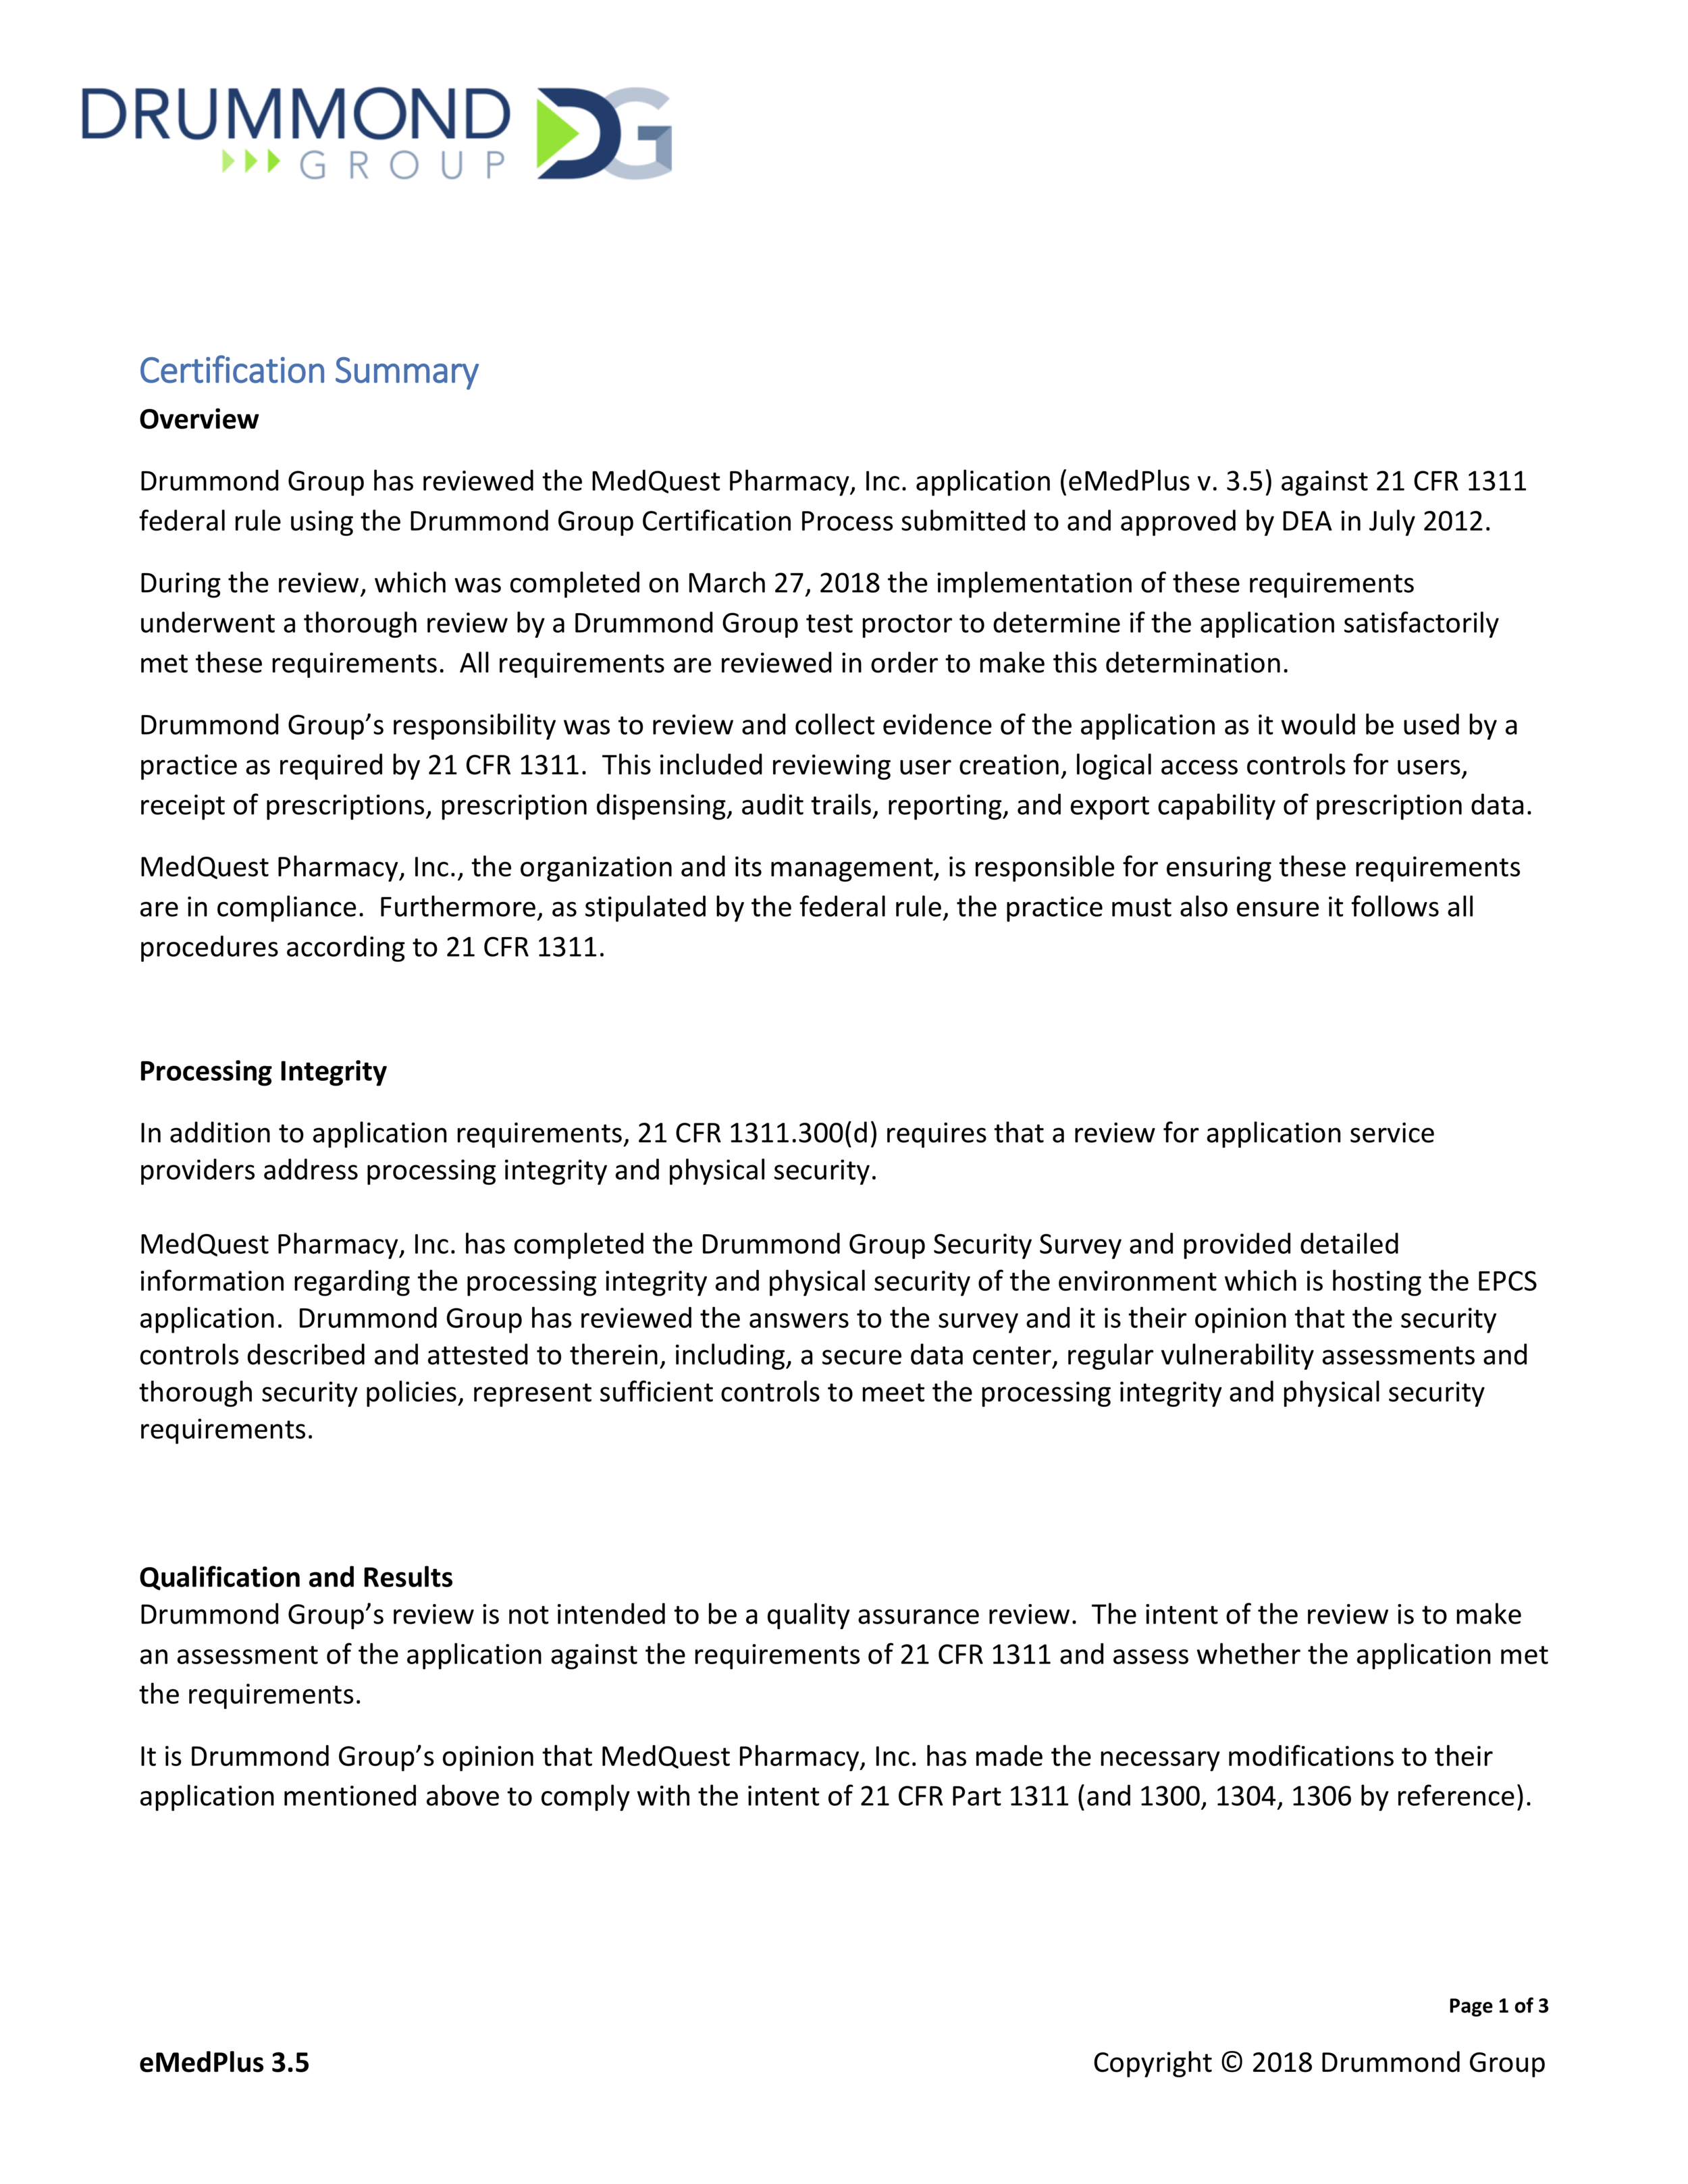 EPCS Certificate Pg. 1.png